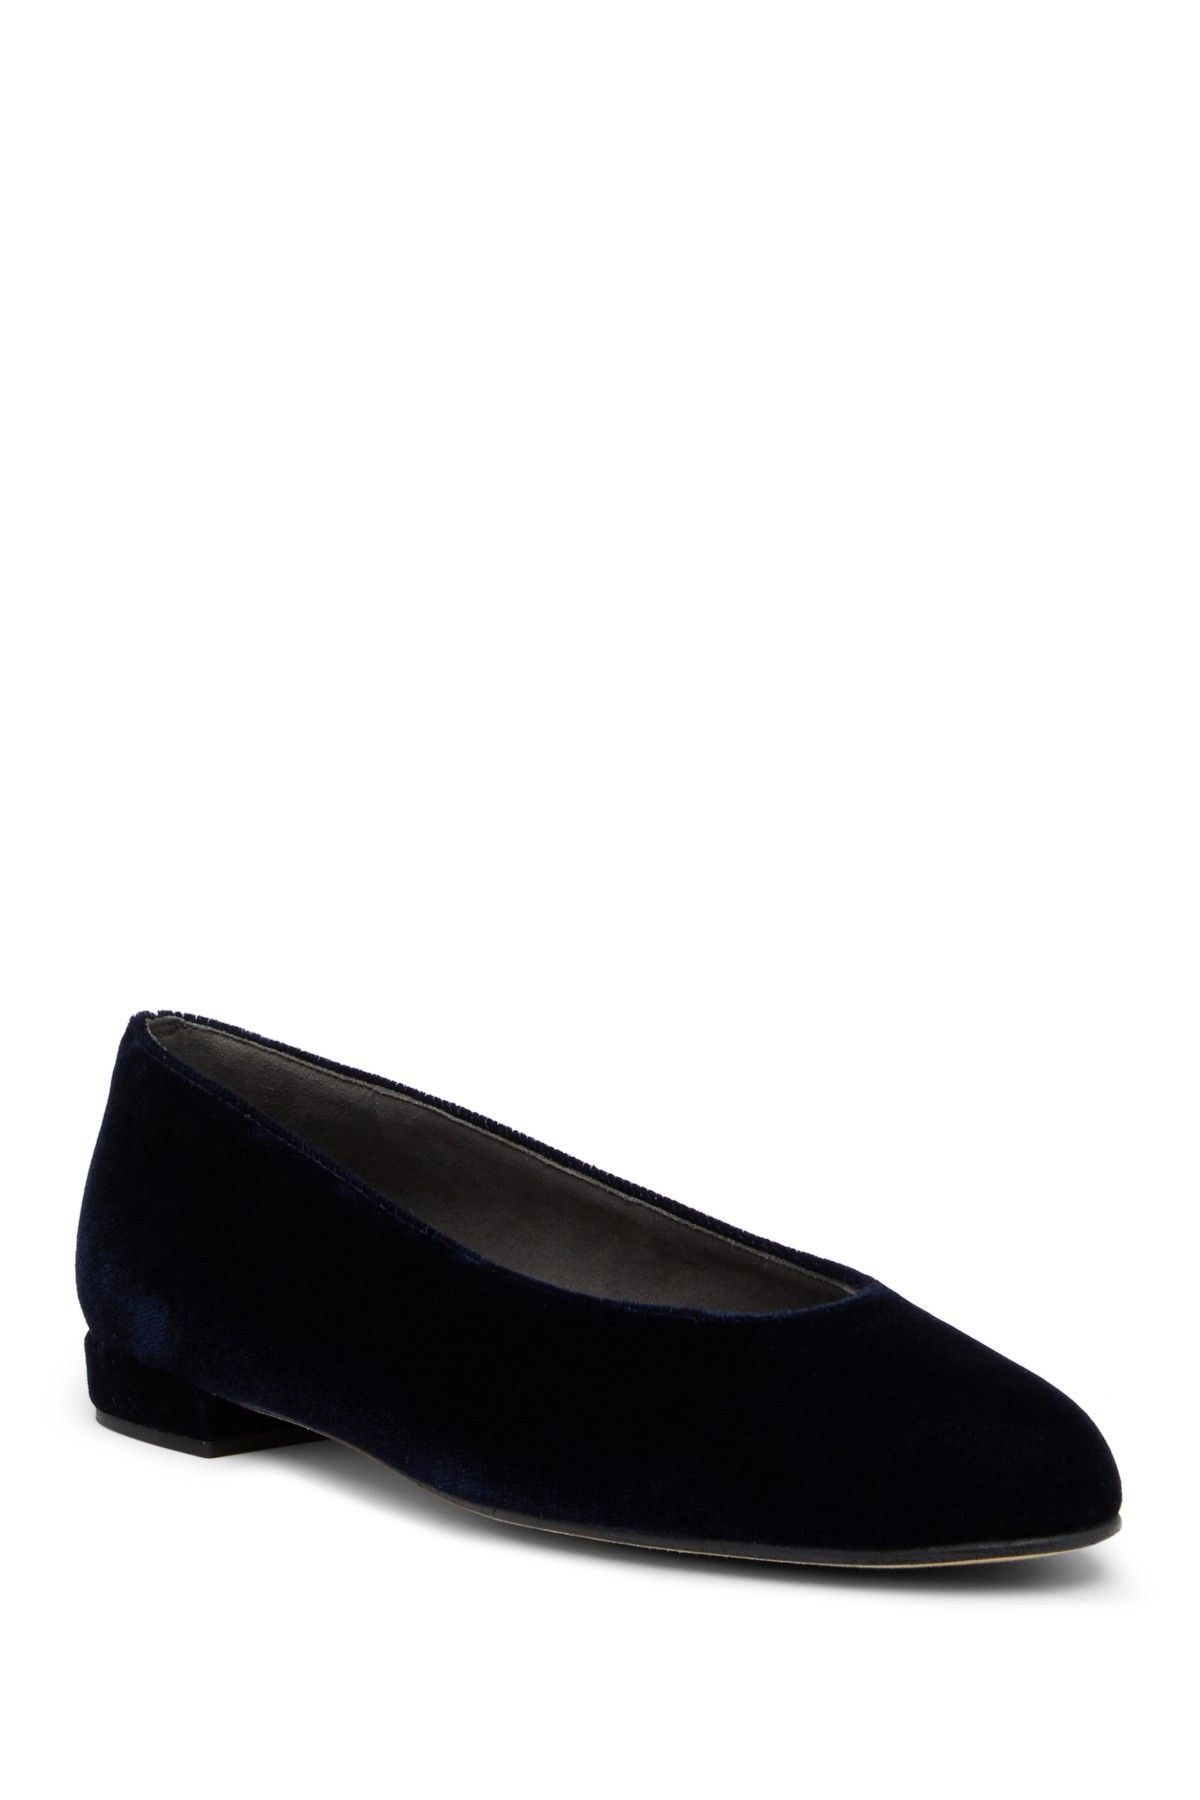 los angeles outlet online best supplier Stuart Weitzman Chic Ballet Flat - Multiple Widths Available ...